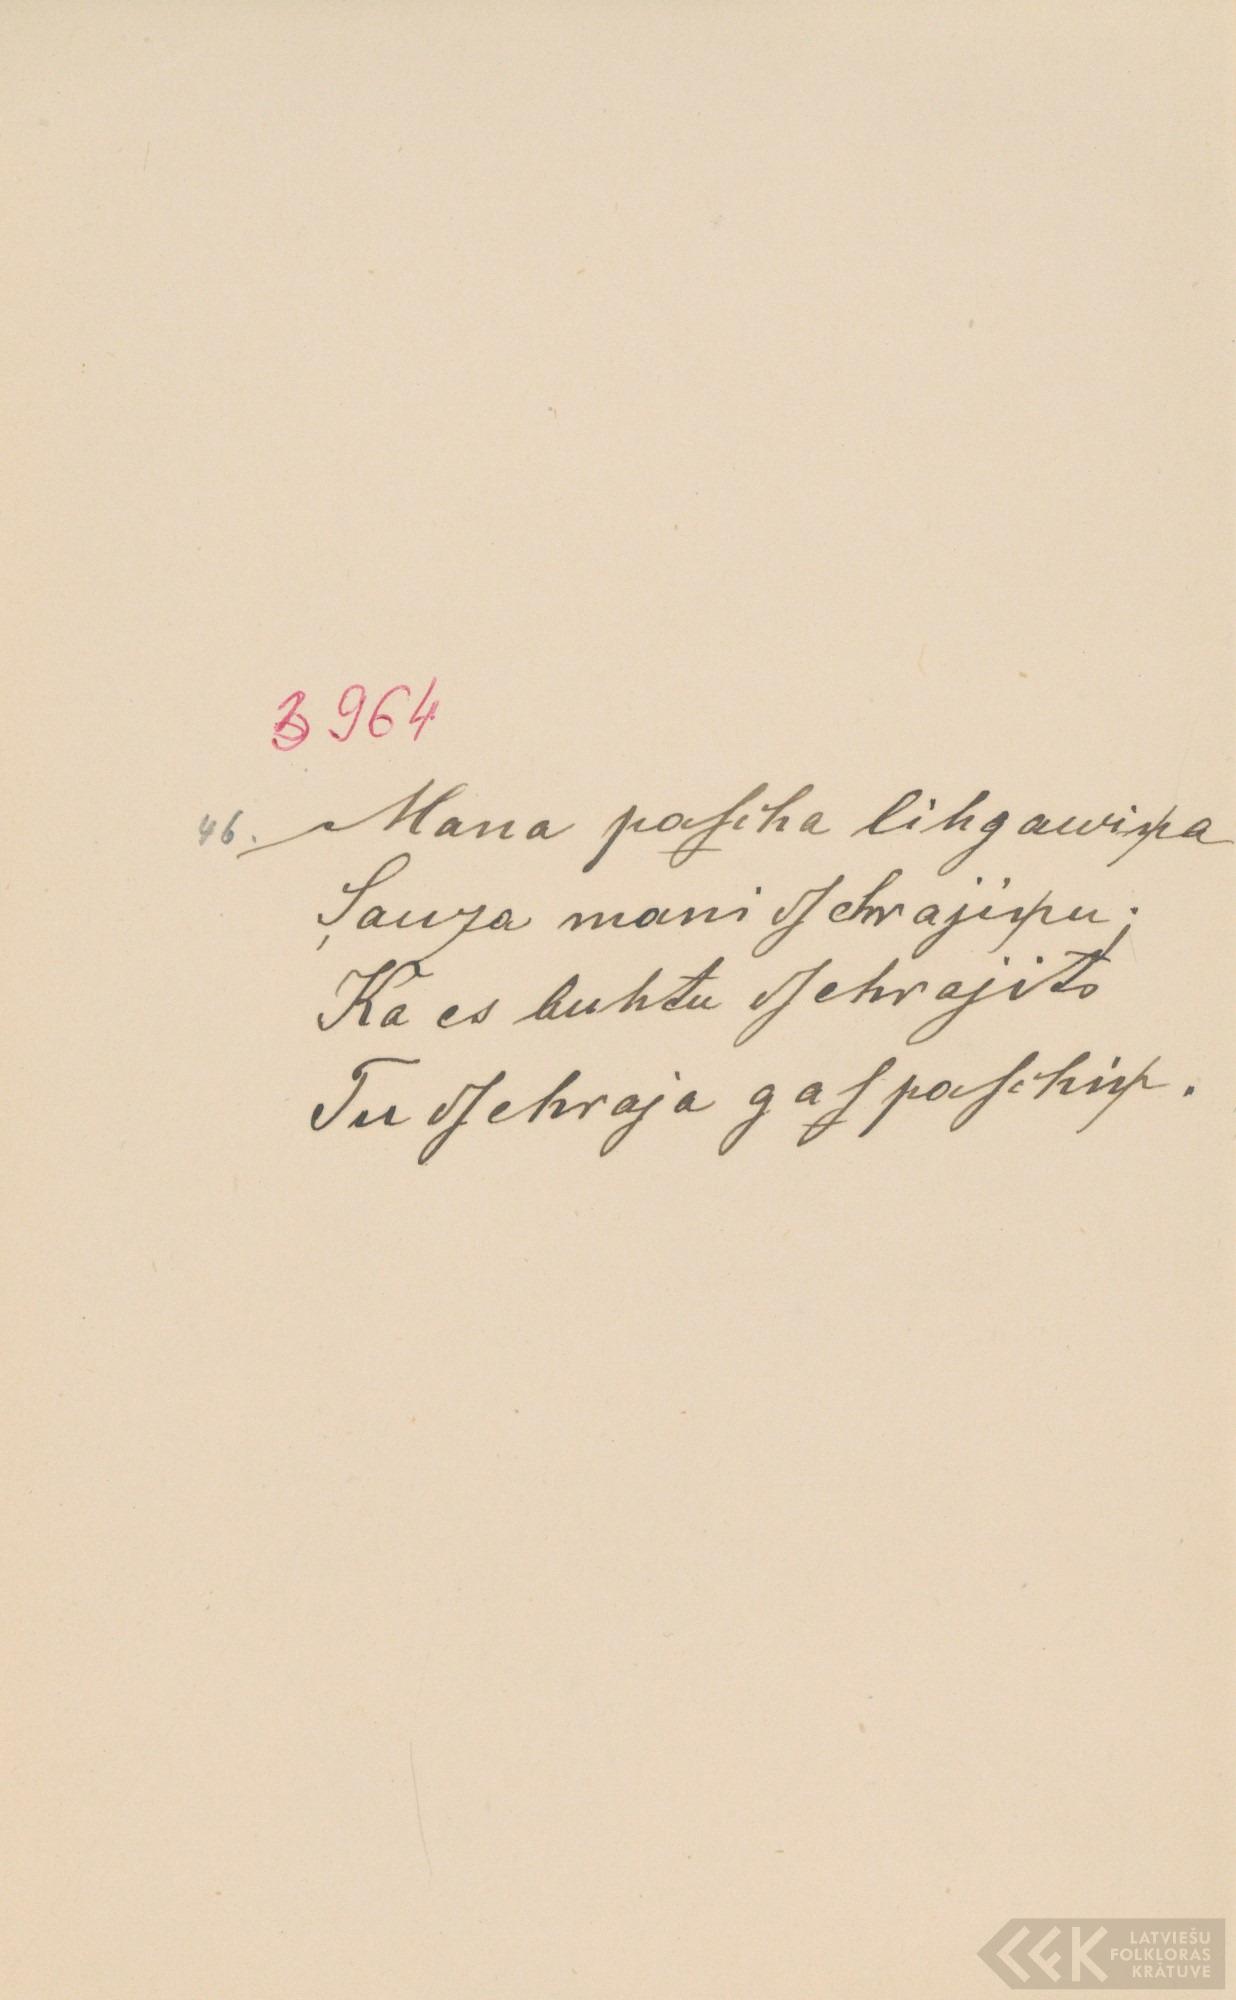 1620-Krisjana-Barona-krajums-07-0182